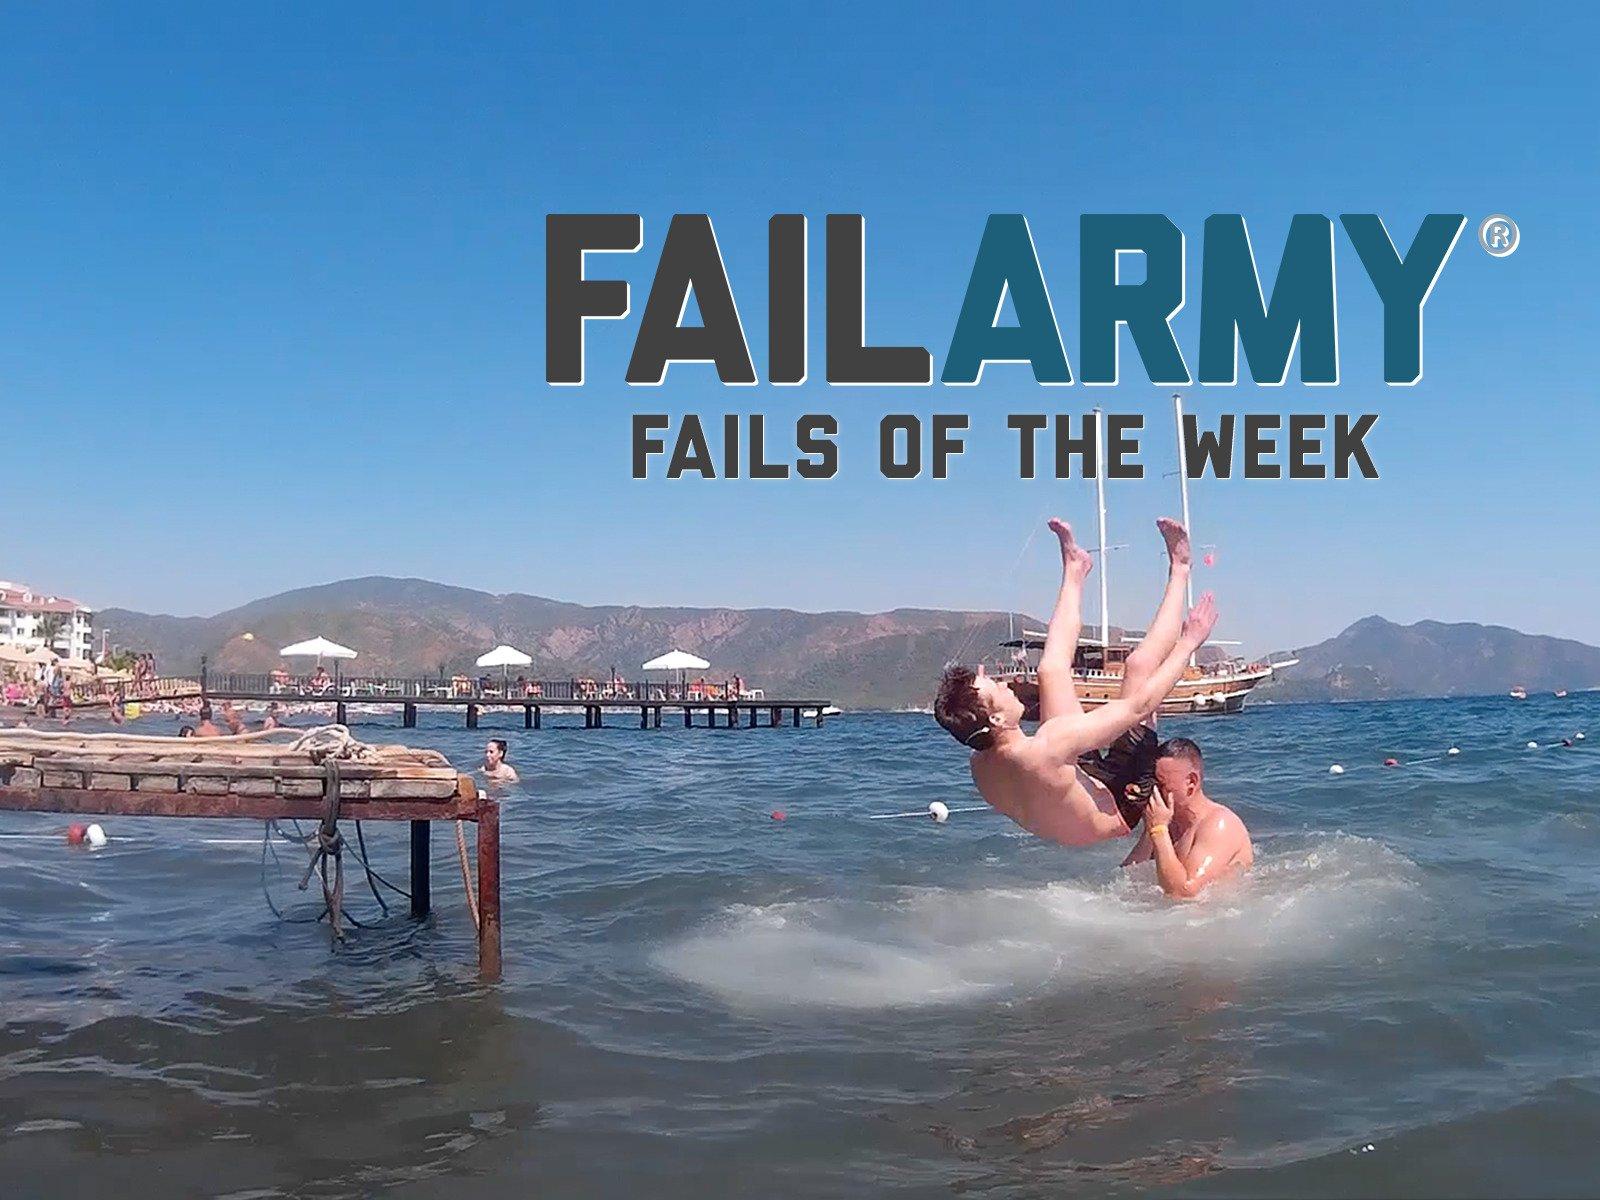 Clip: Fails of the Week - Season 10